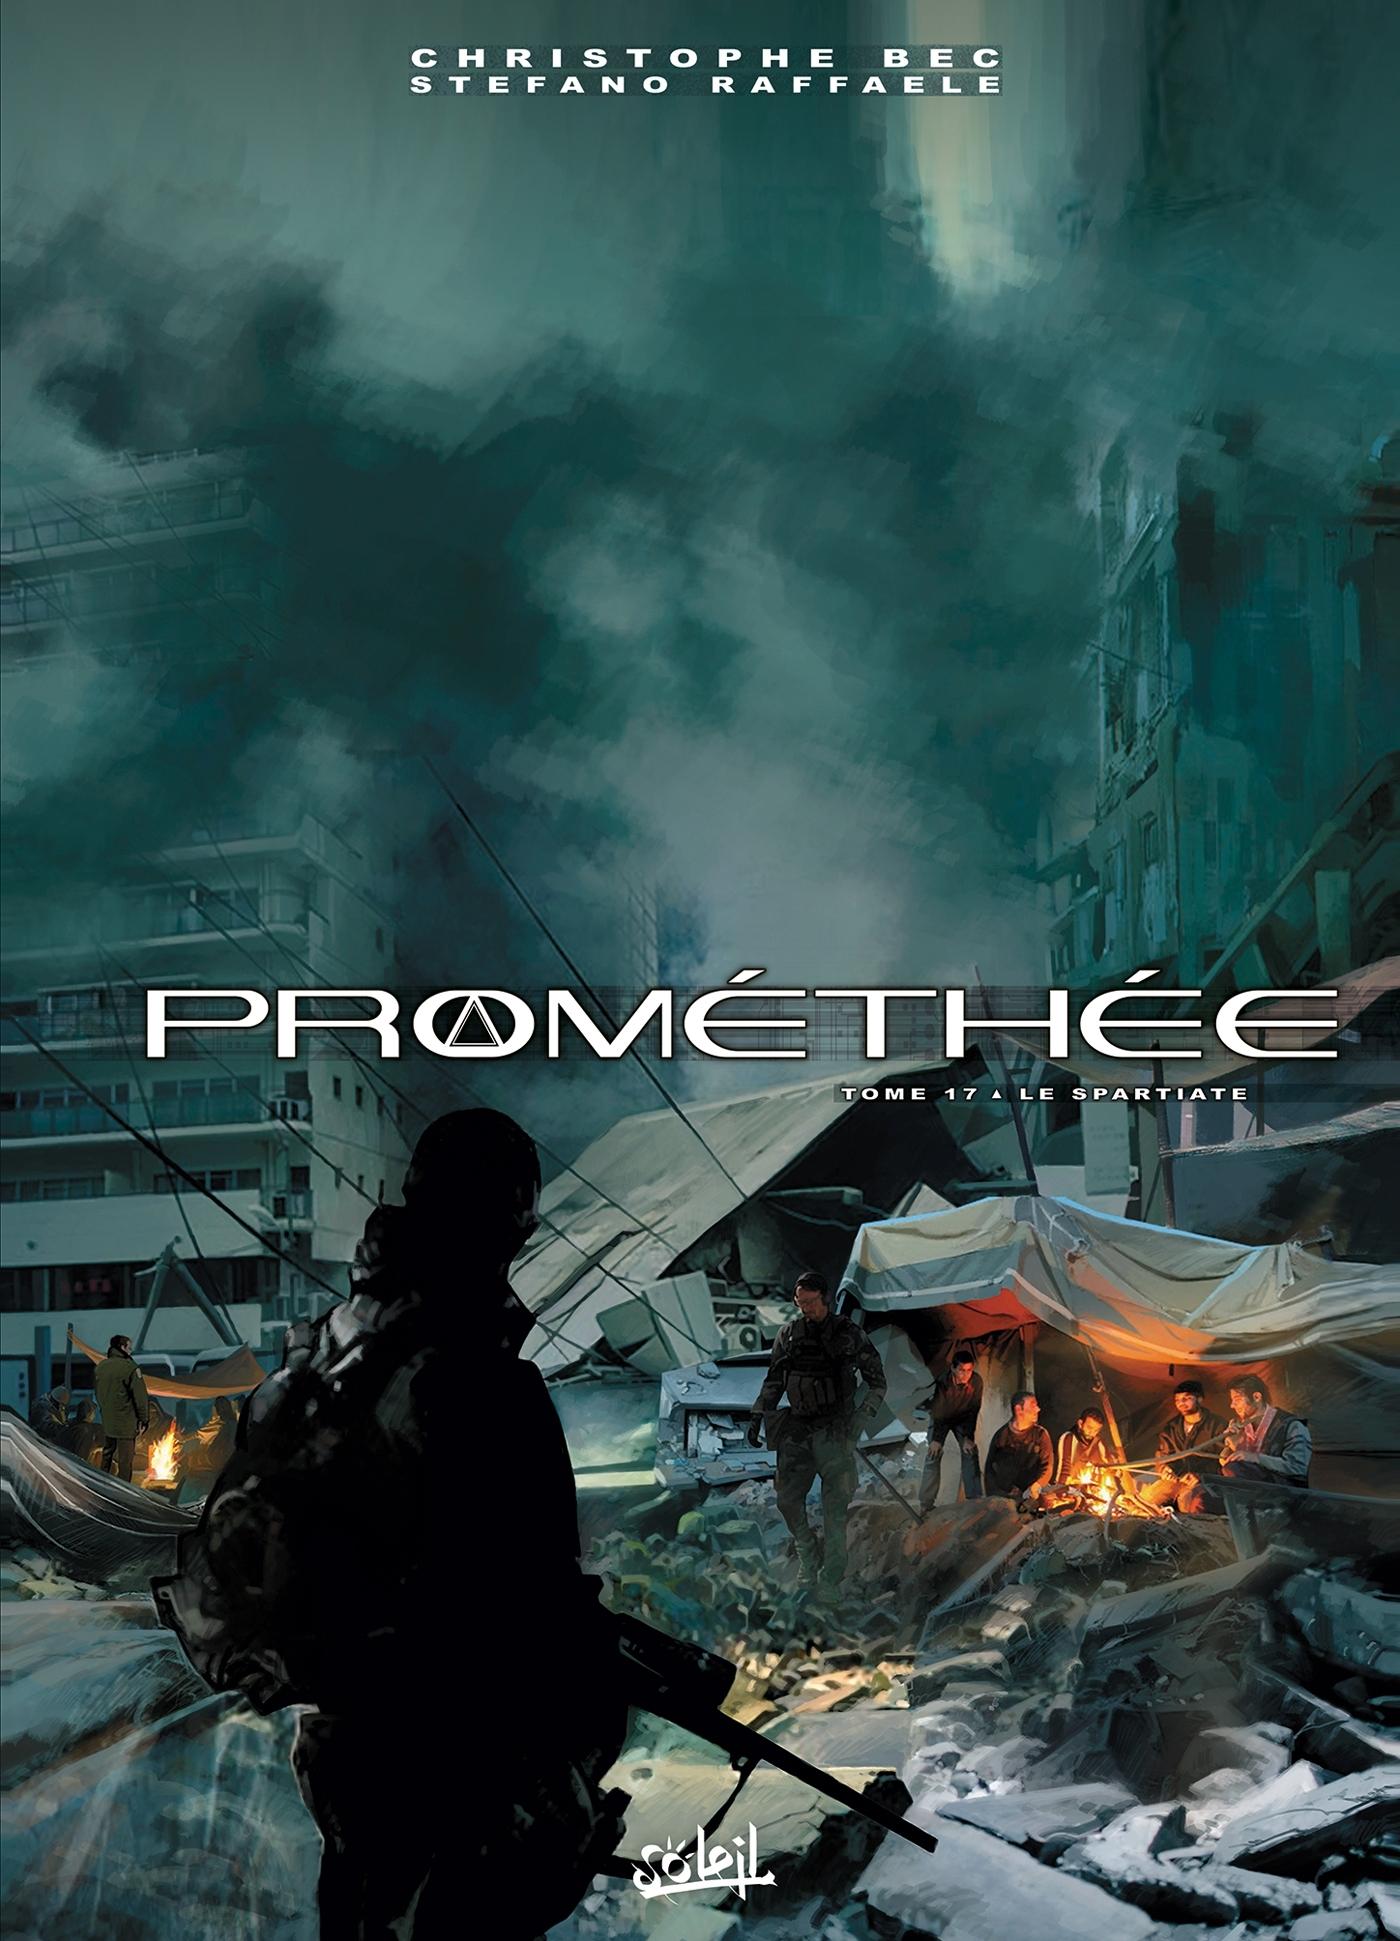 PROMETHEE 17 - LE SPARTIATE